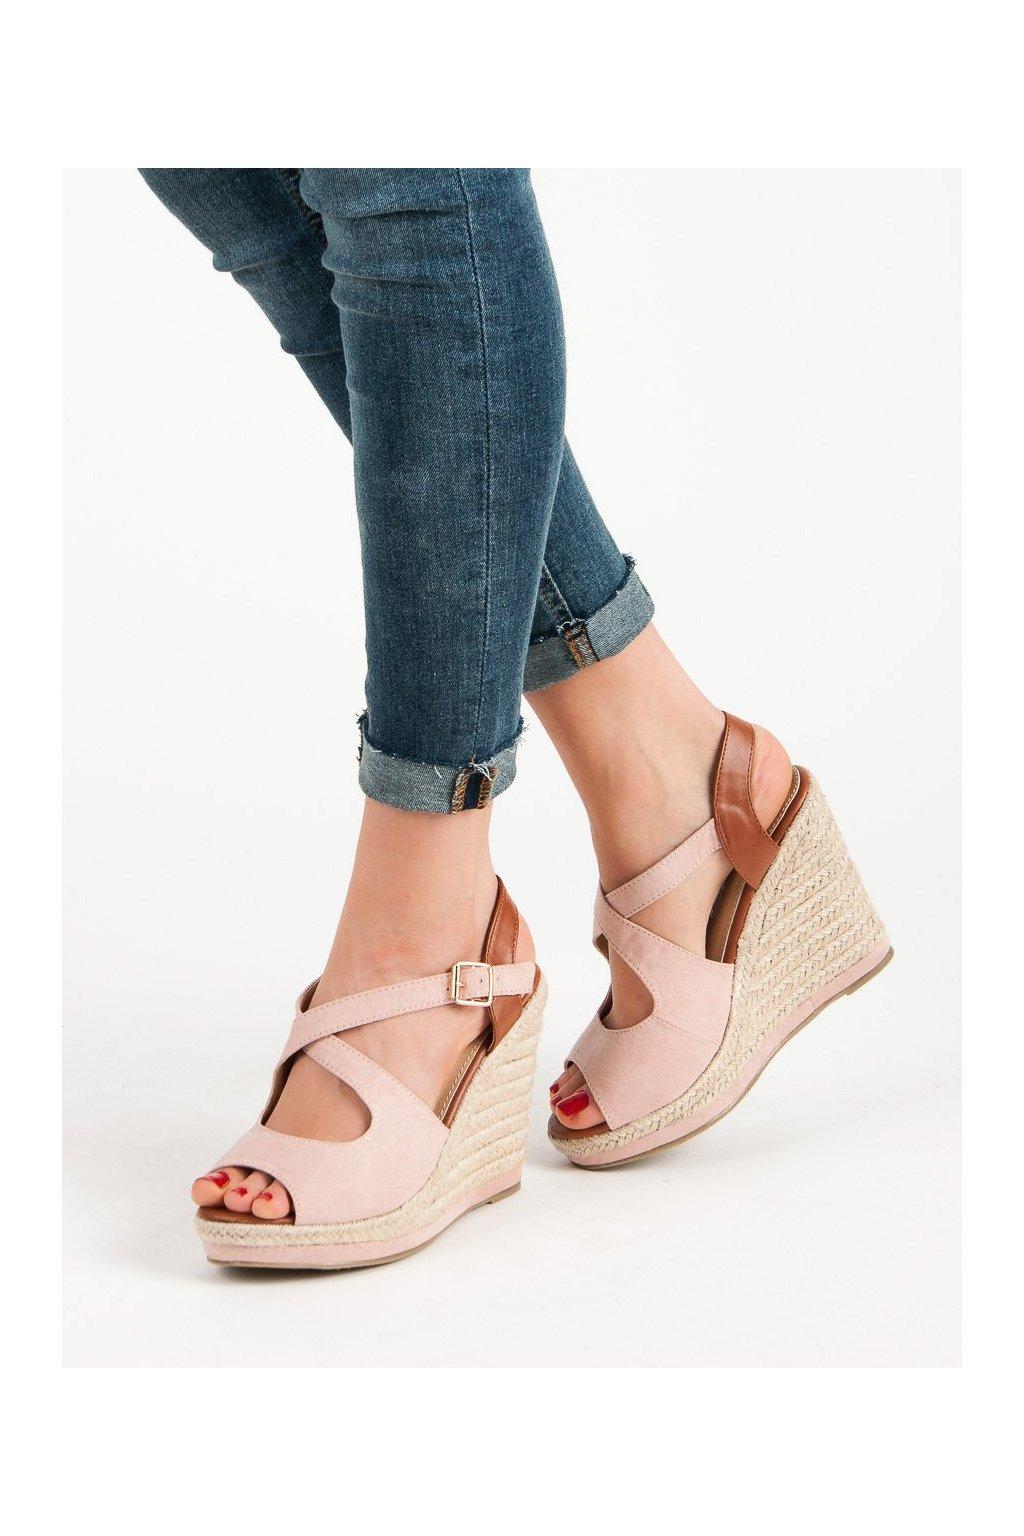 96422d9782 Ružové dámske sandále na platforme Laura mode LM-0205P